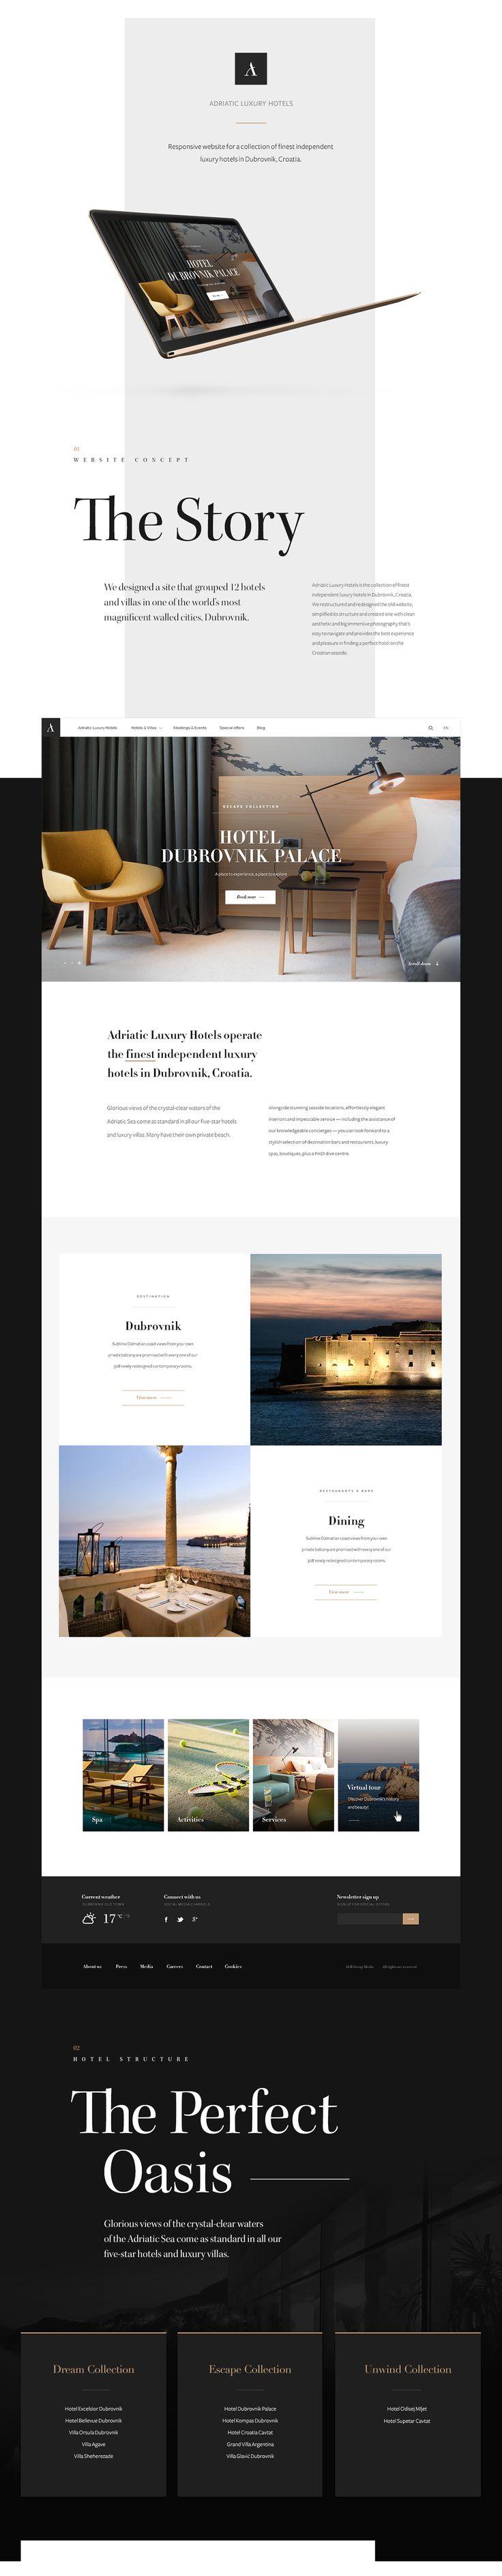 Adriatic Luxury Hotels Website | Abduzeedo Design Inspiration